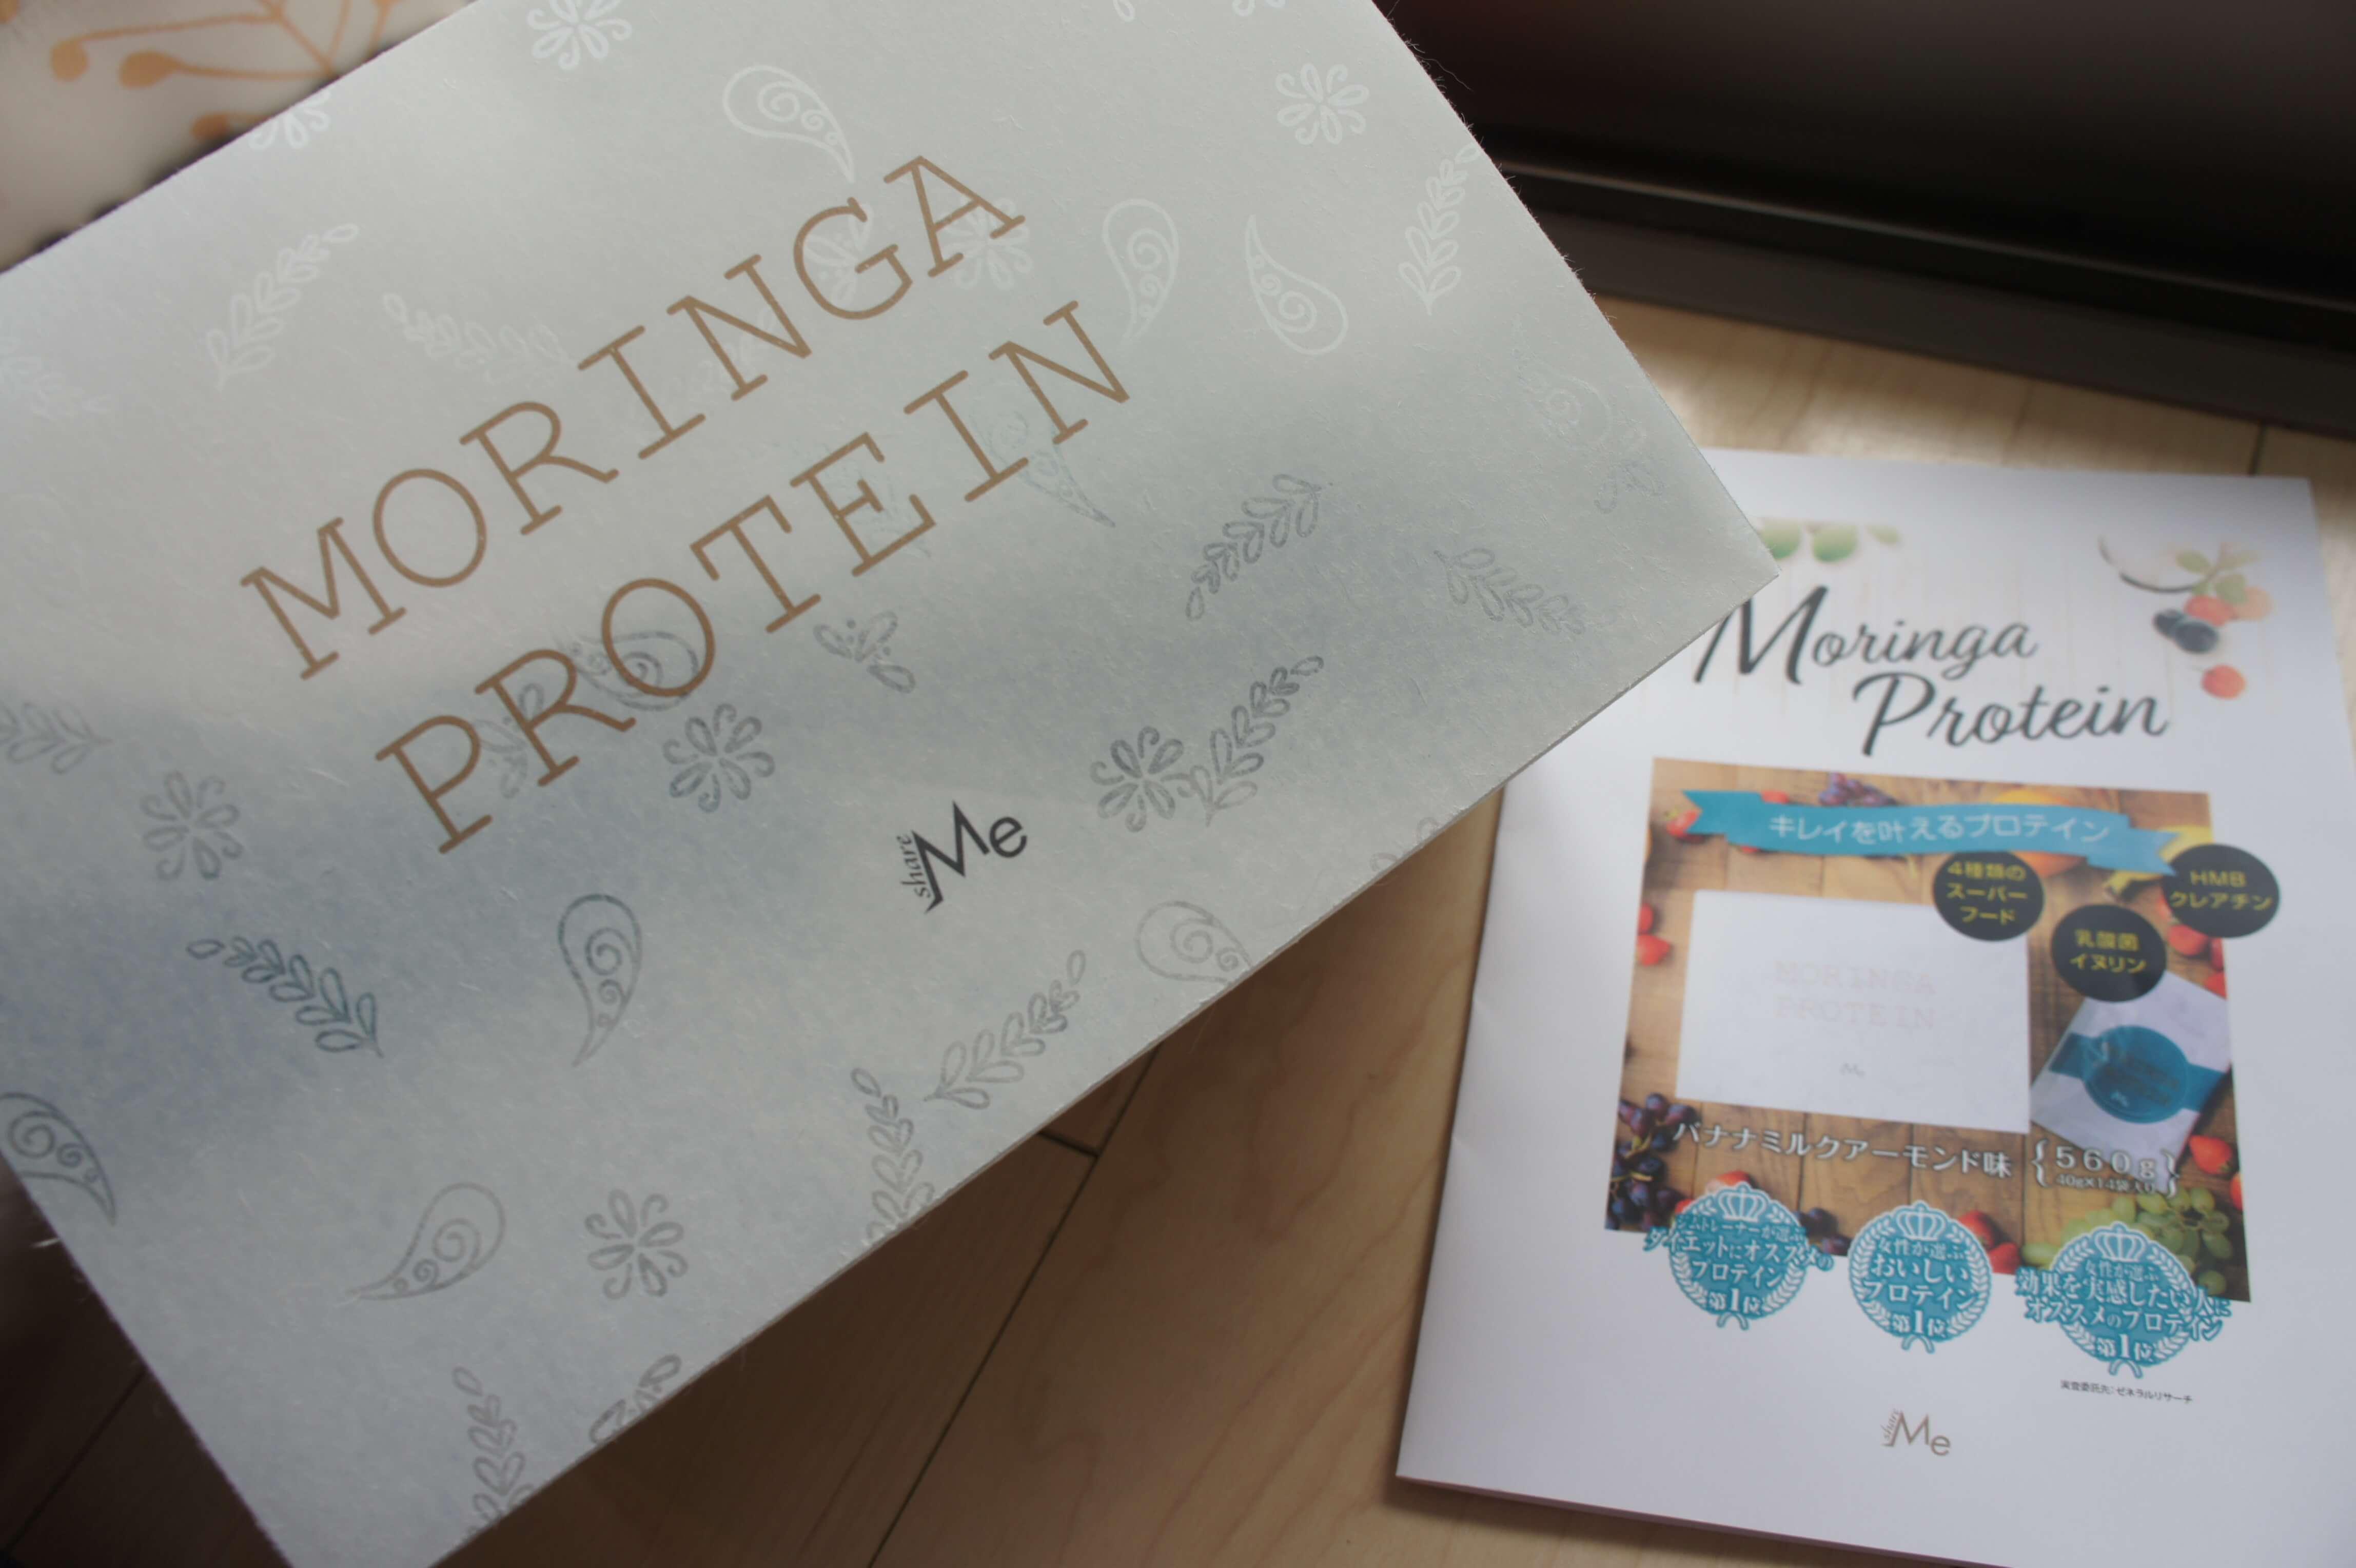 MORINGA PROTEIN モリンガプロテイン レビュー 感想 口コミ